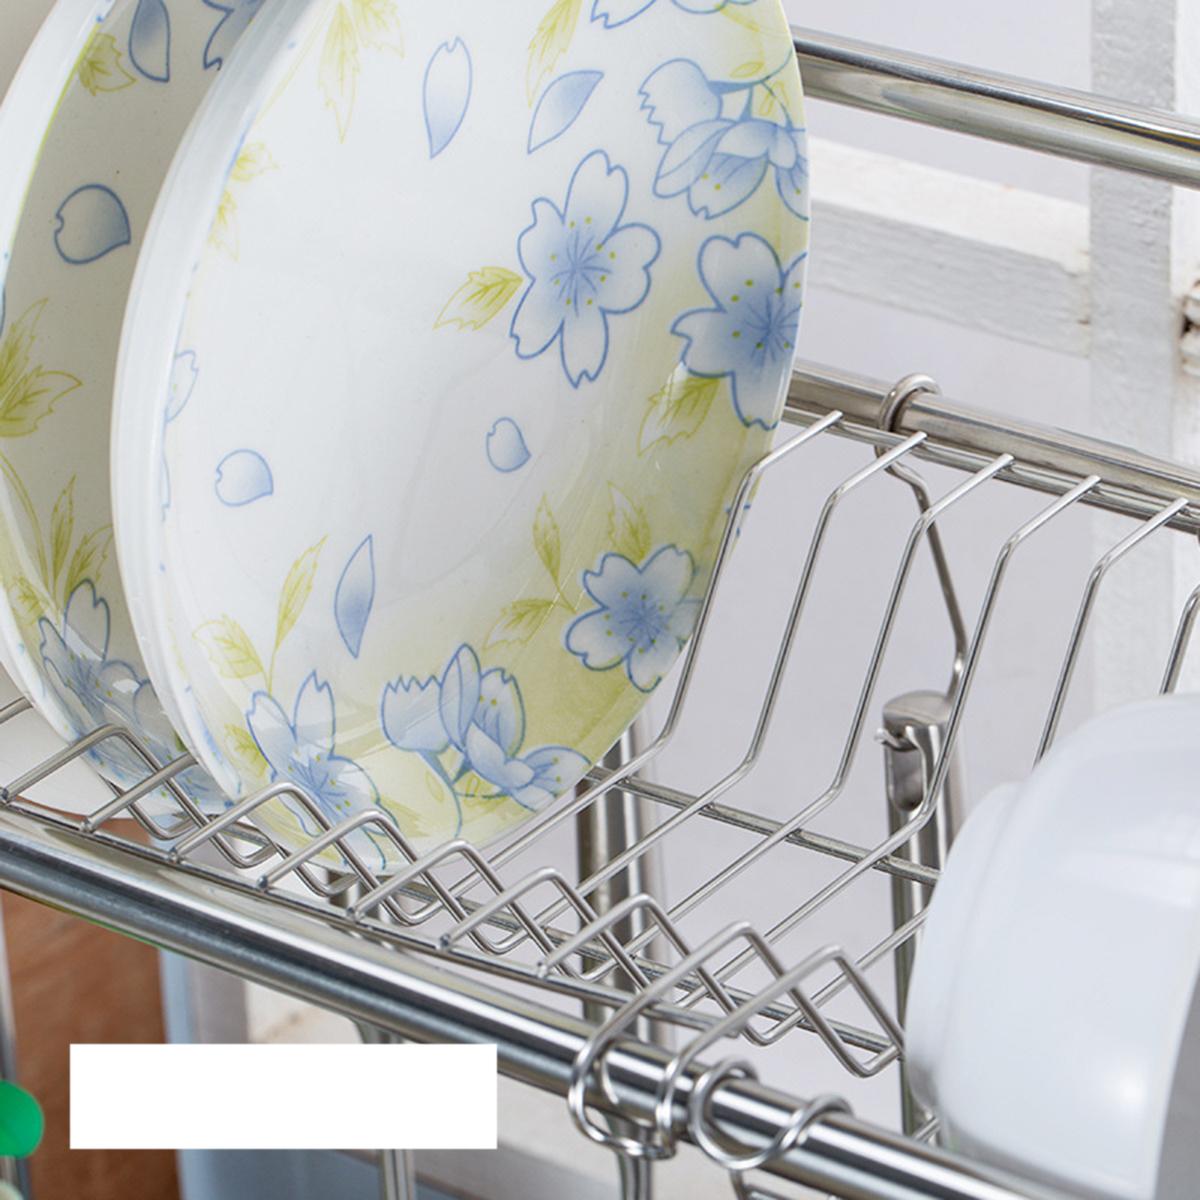 2 Tiers Stainless Steel Dishes Rack Dual Sink Drain Rack Adjustable Multi-use Kitchen Organizer Rack Dish Shelf Sink Drying Rack